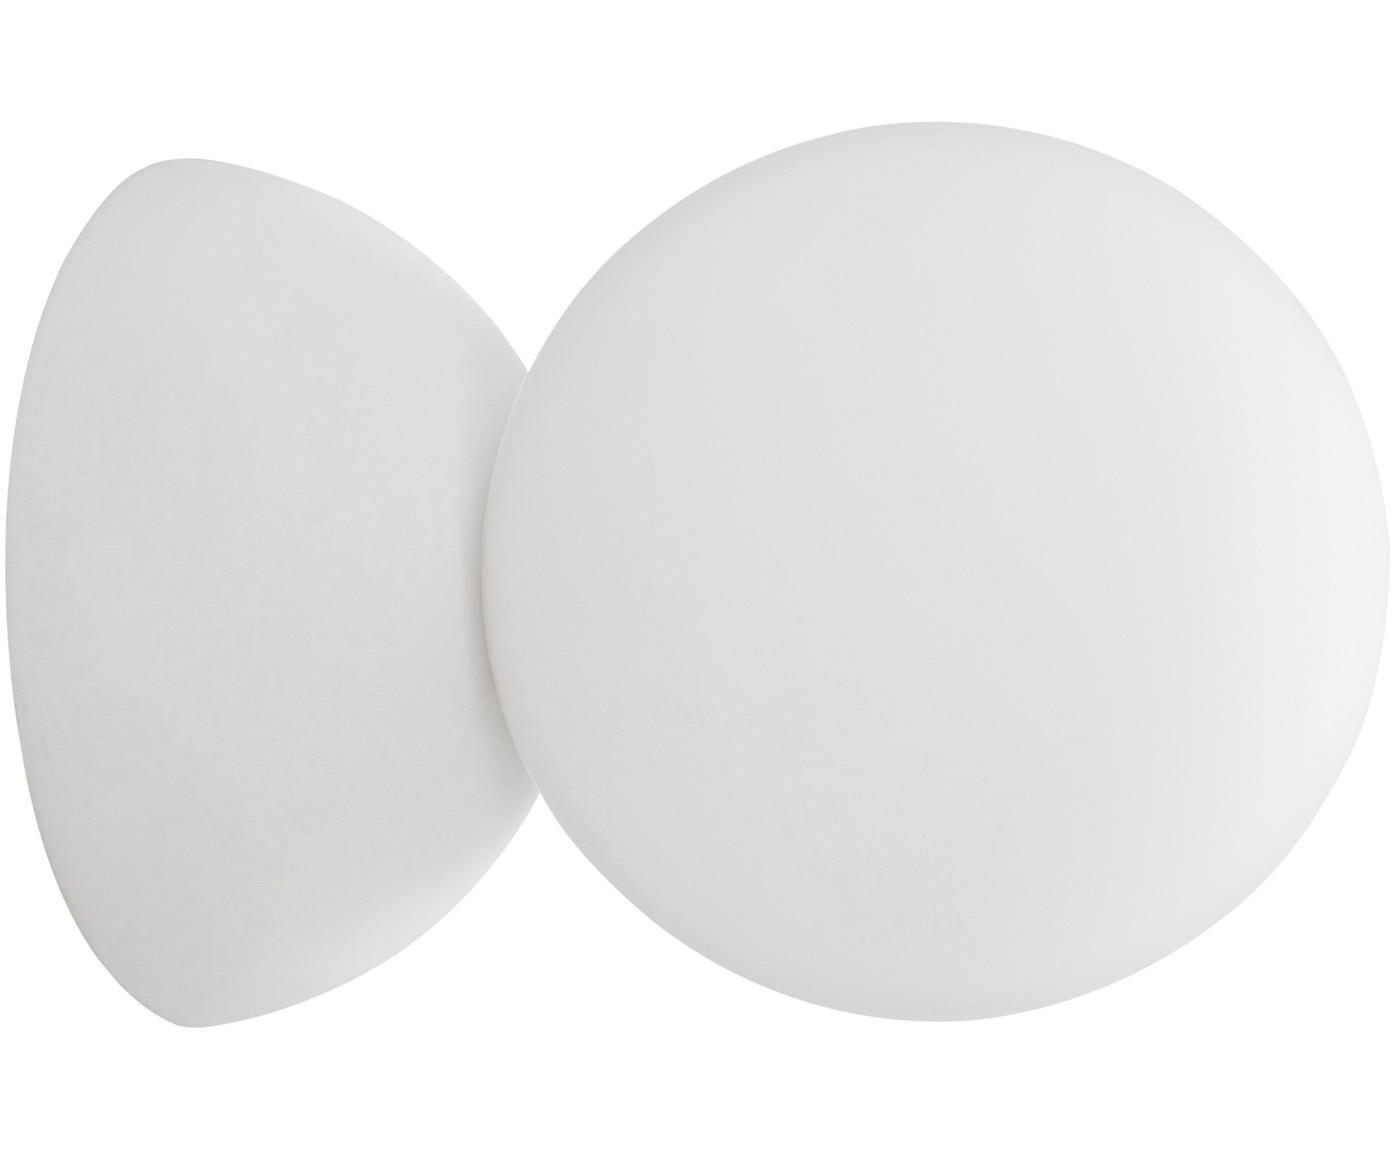 Wandlamp Zero van opaalglas, Lampenkap: opaalglas, Wit, Ø 10 x D 14 cm